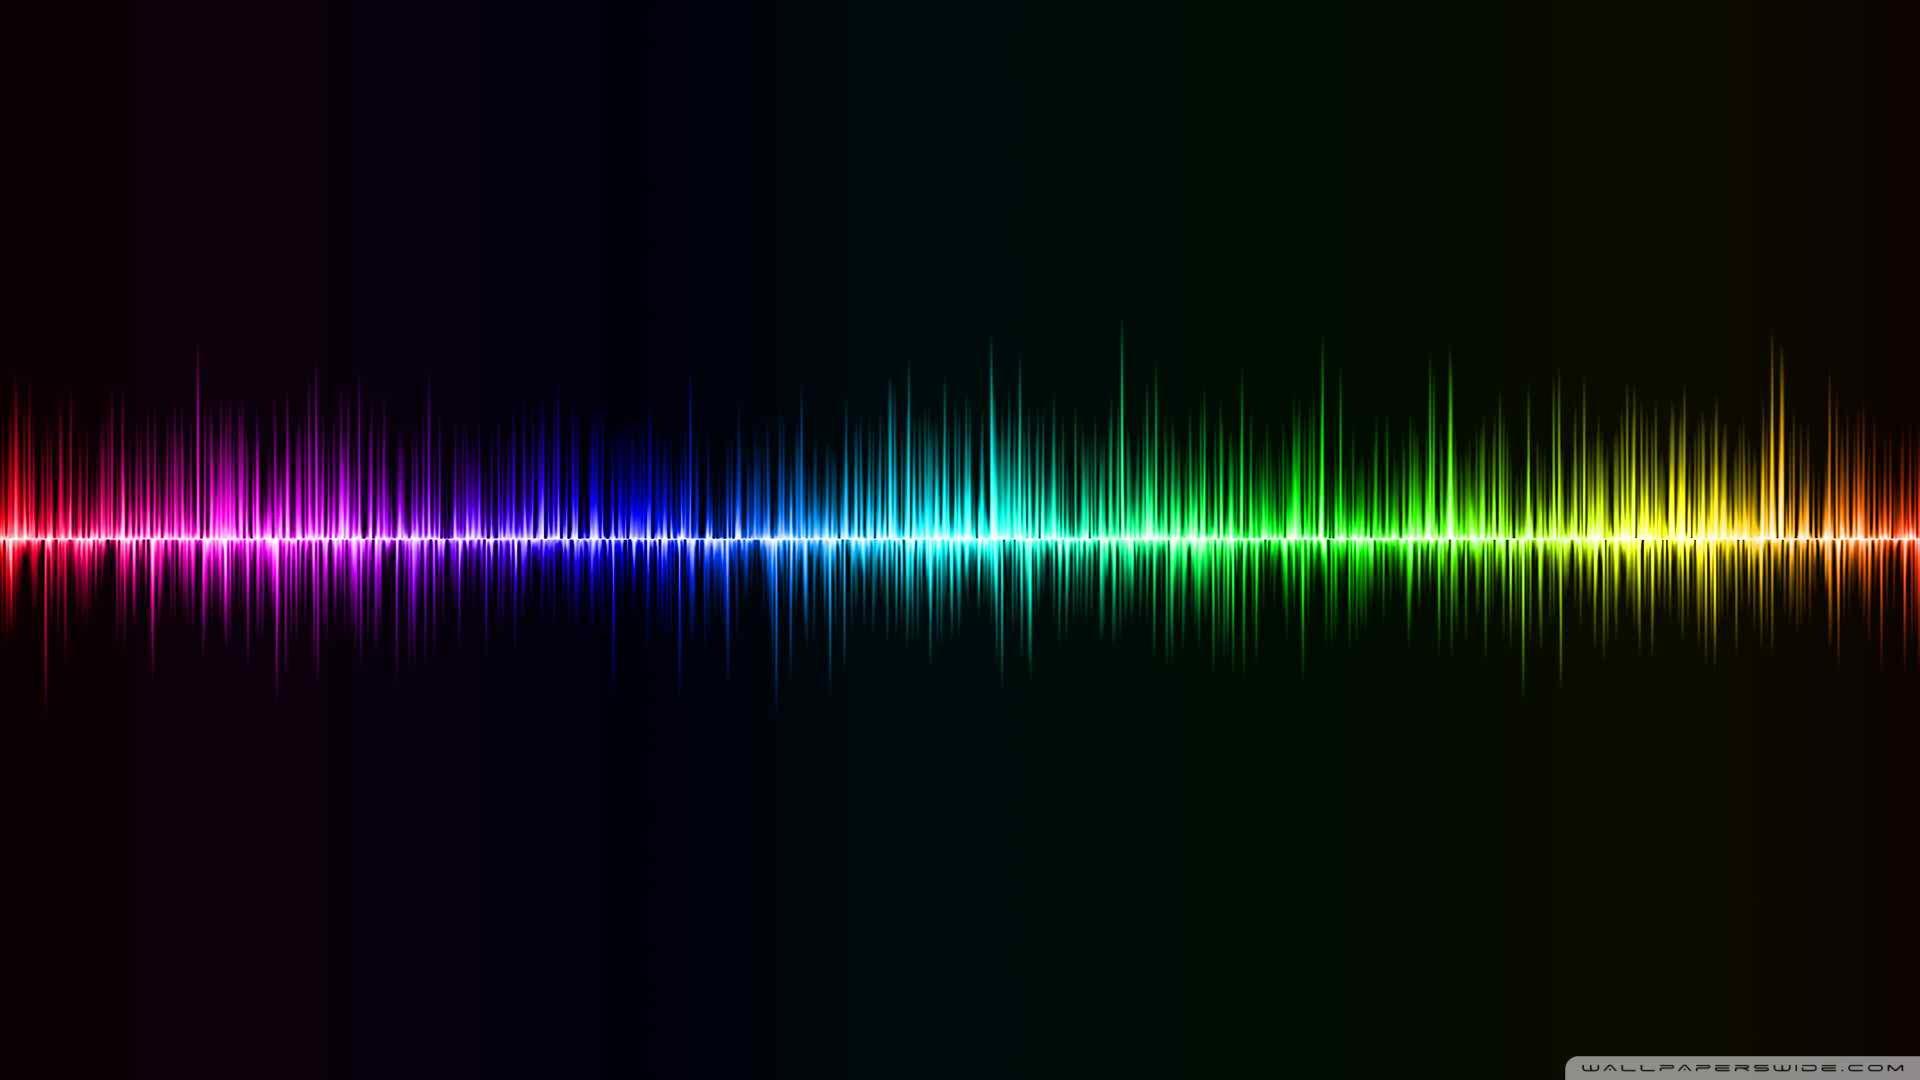 Alfa img – Showing > Music Beat Wave Gif